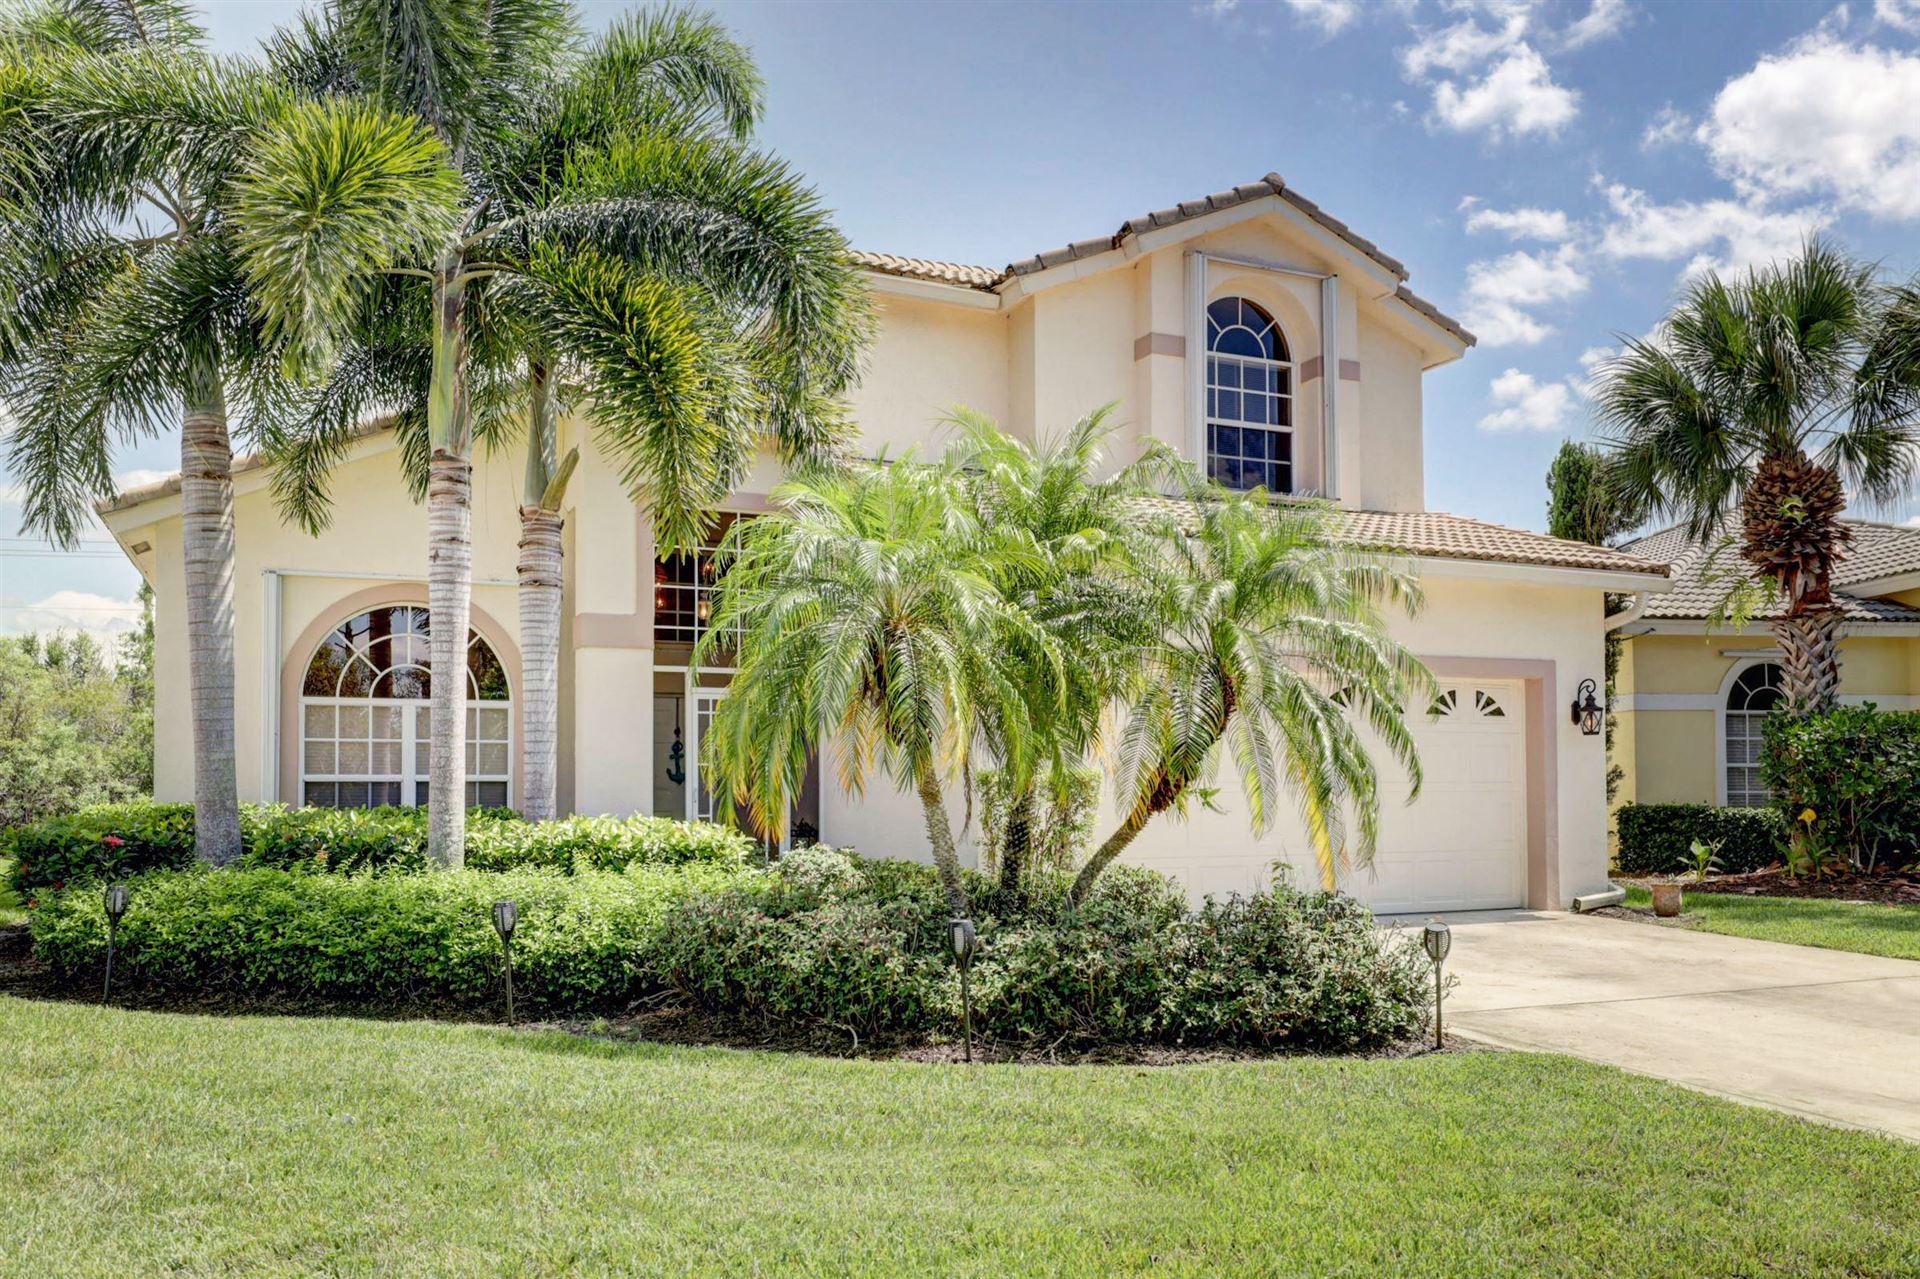 4862 SE Devenwood Way, Stuart, FL 34997 - #: RX-10638398